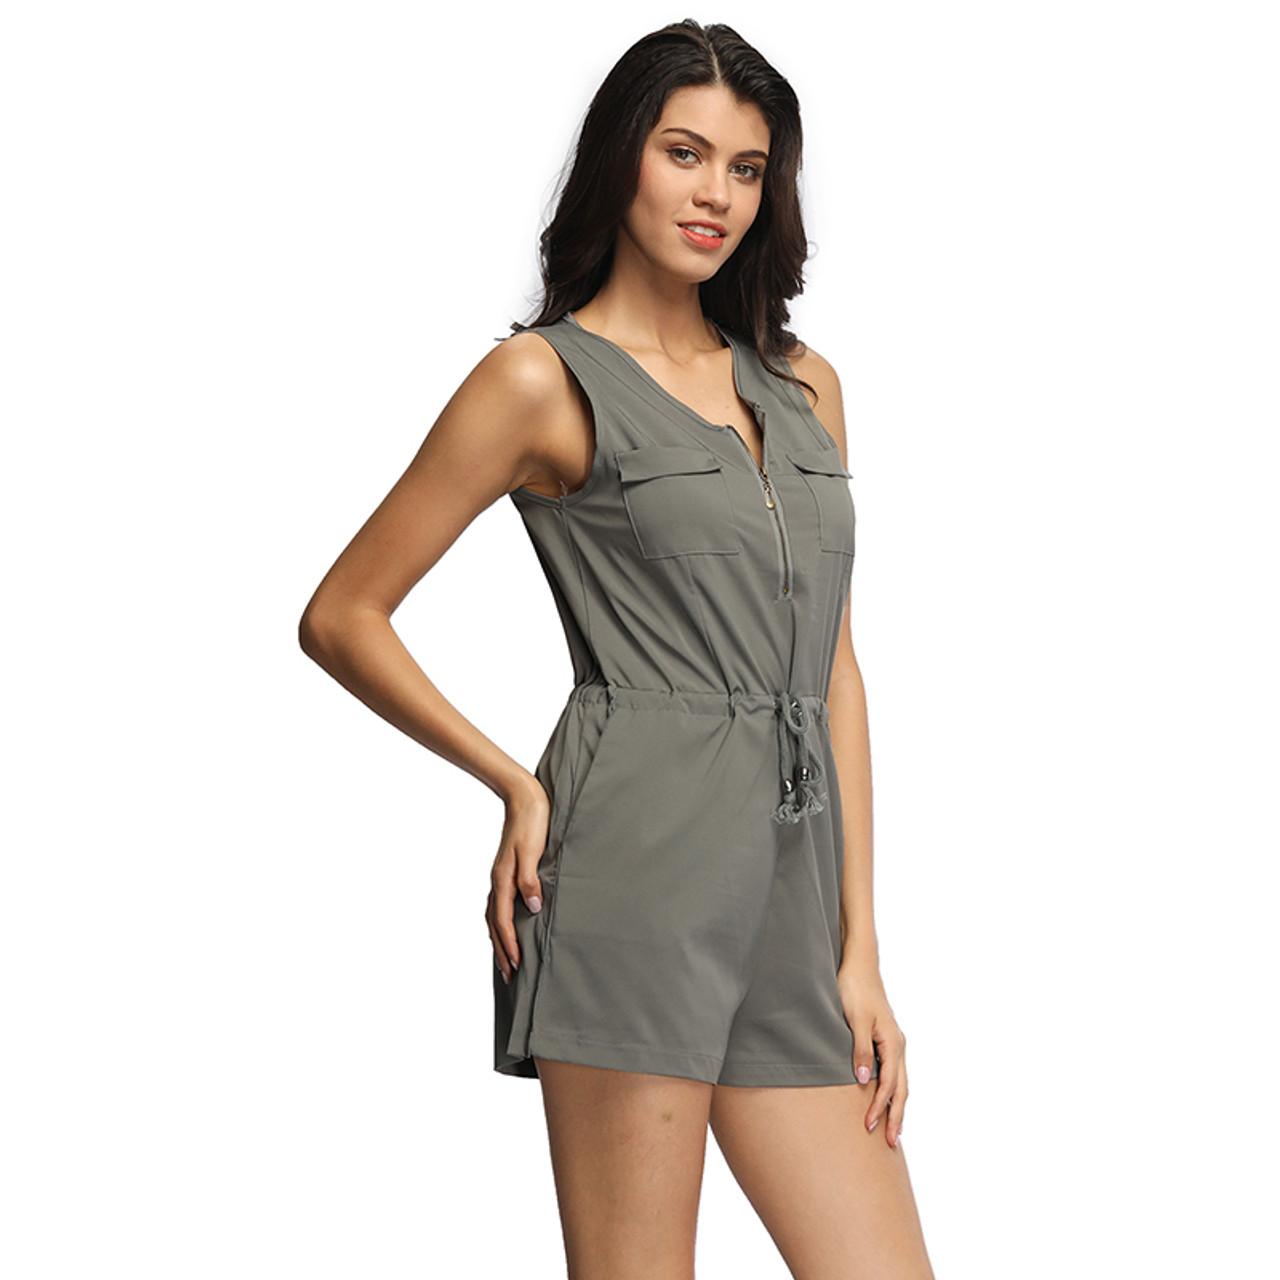 3e15898f74b ... Sexy Sleeveless Bodysuit Women Jumpsuit Shorts Romper Summer V-neck  Zipper Pockets Playsuit Fashion Beach ...